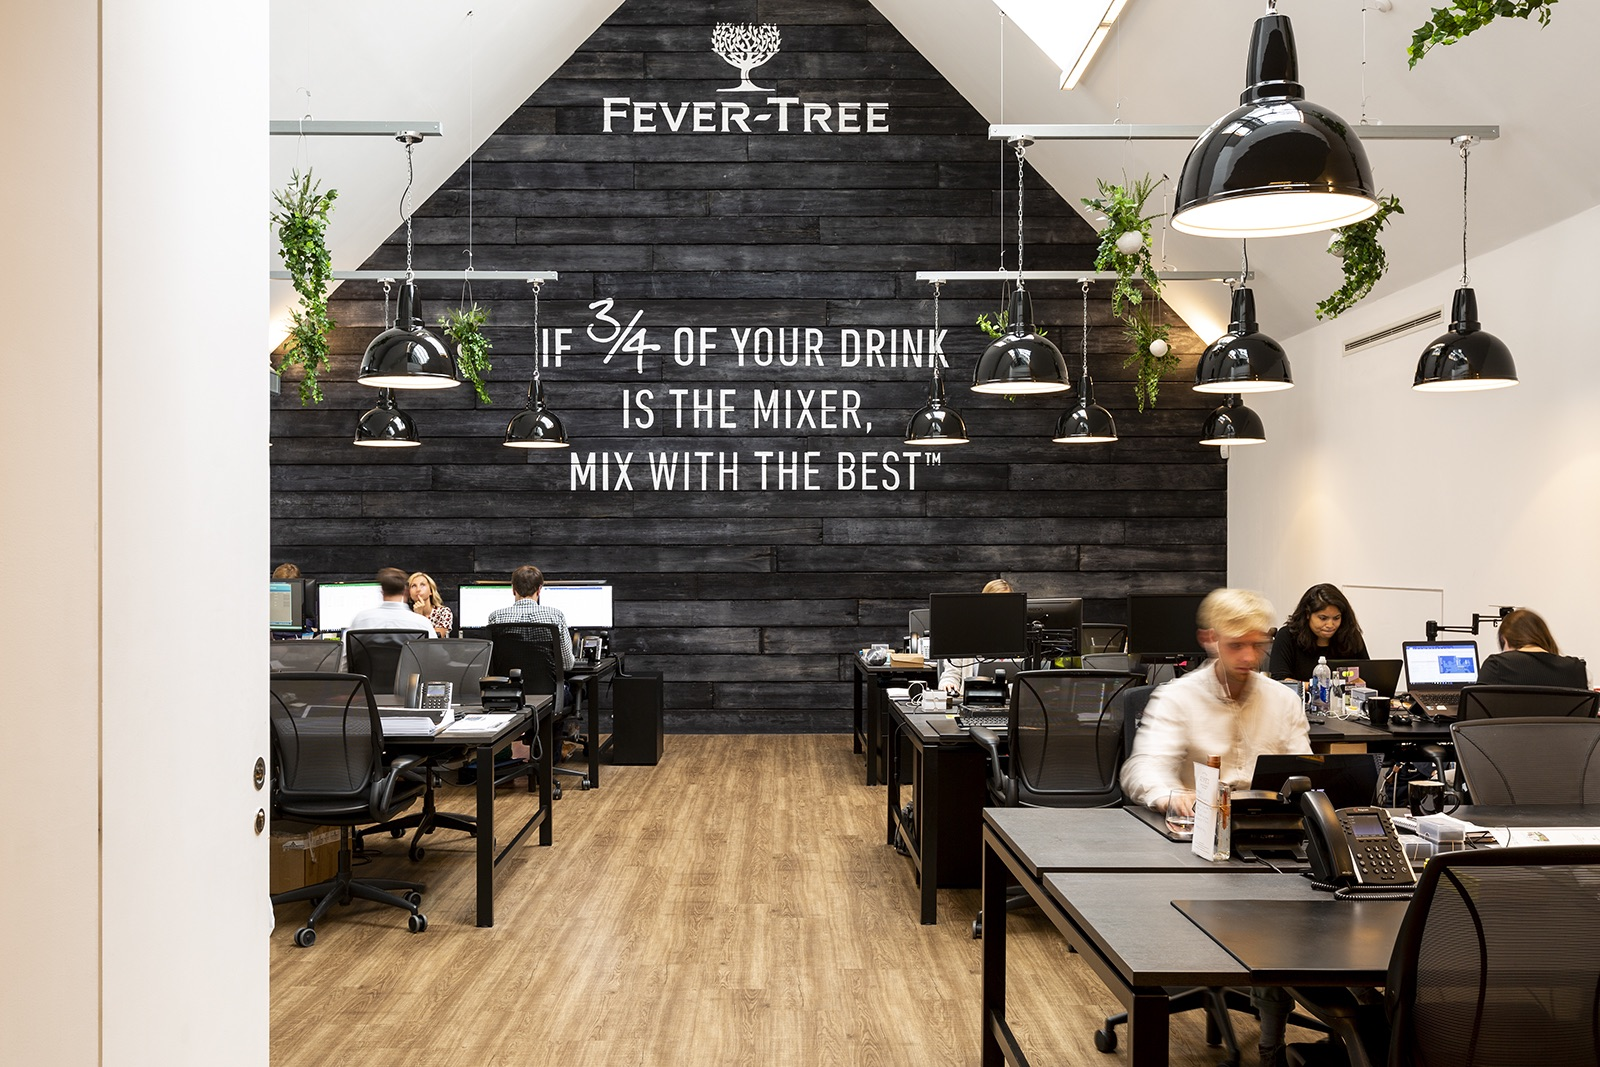 fevertree-office-london-10